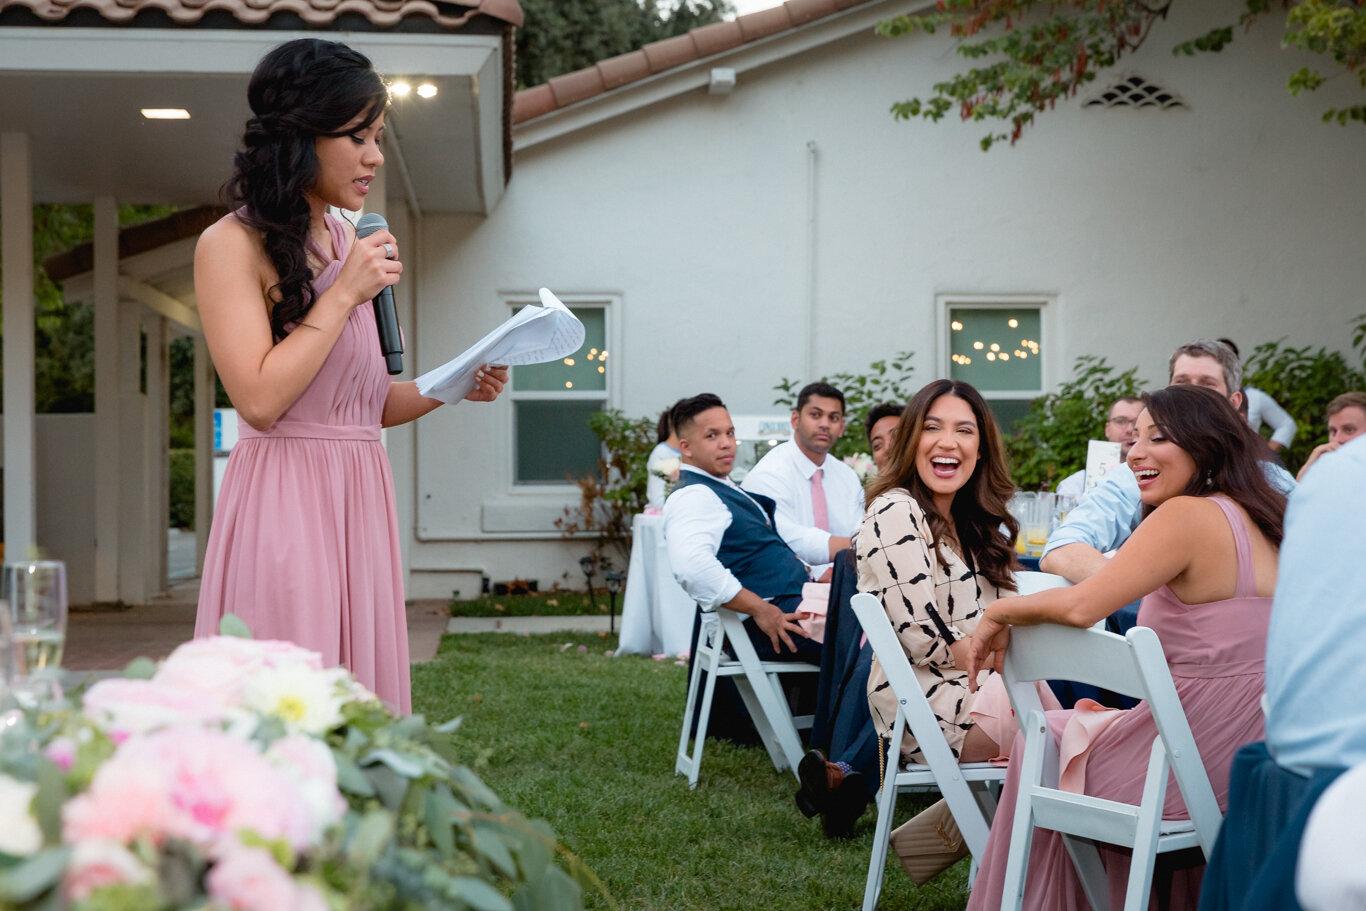 2019.08.24_Emily-Ashir-Wedding-at-the-Maples-6303.jpg